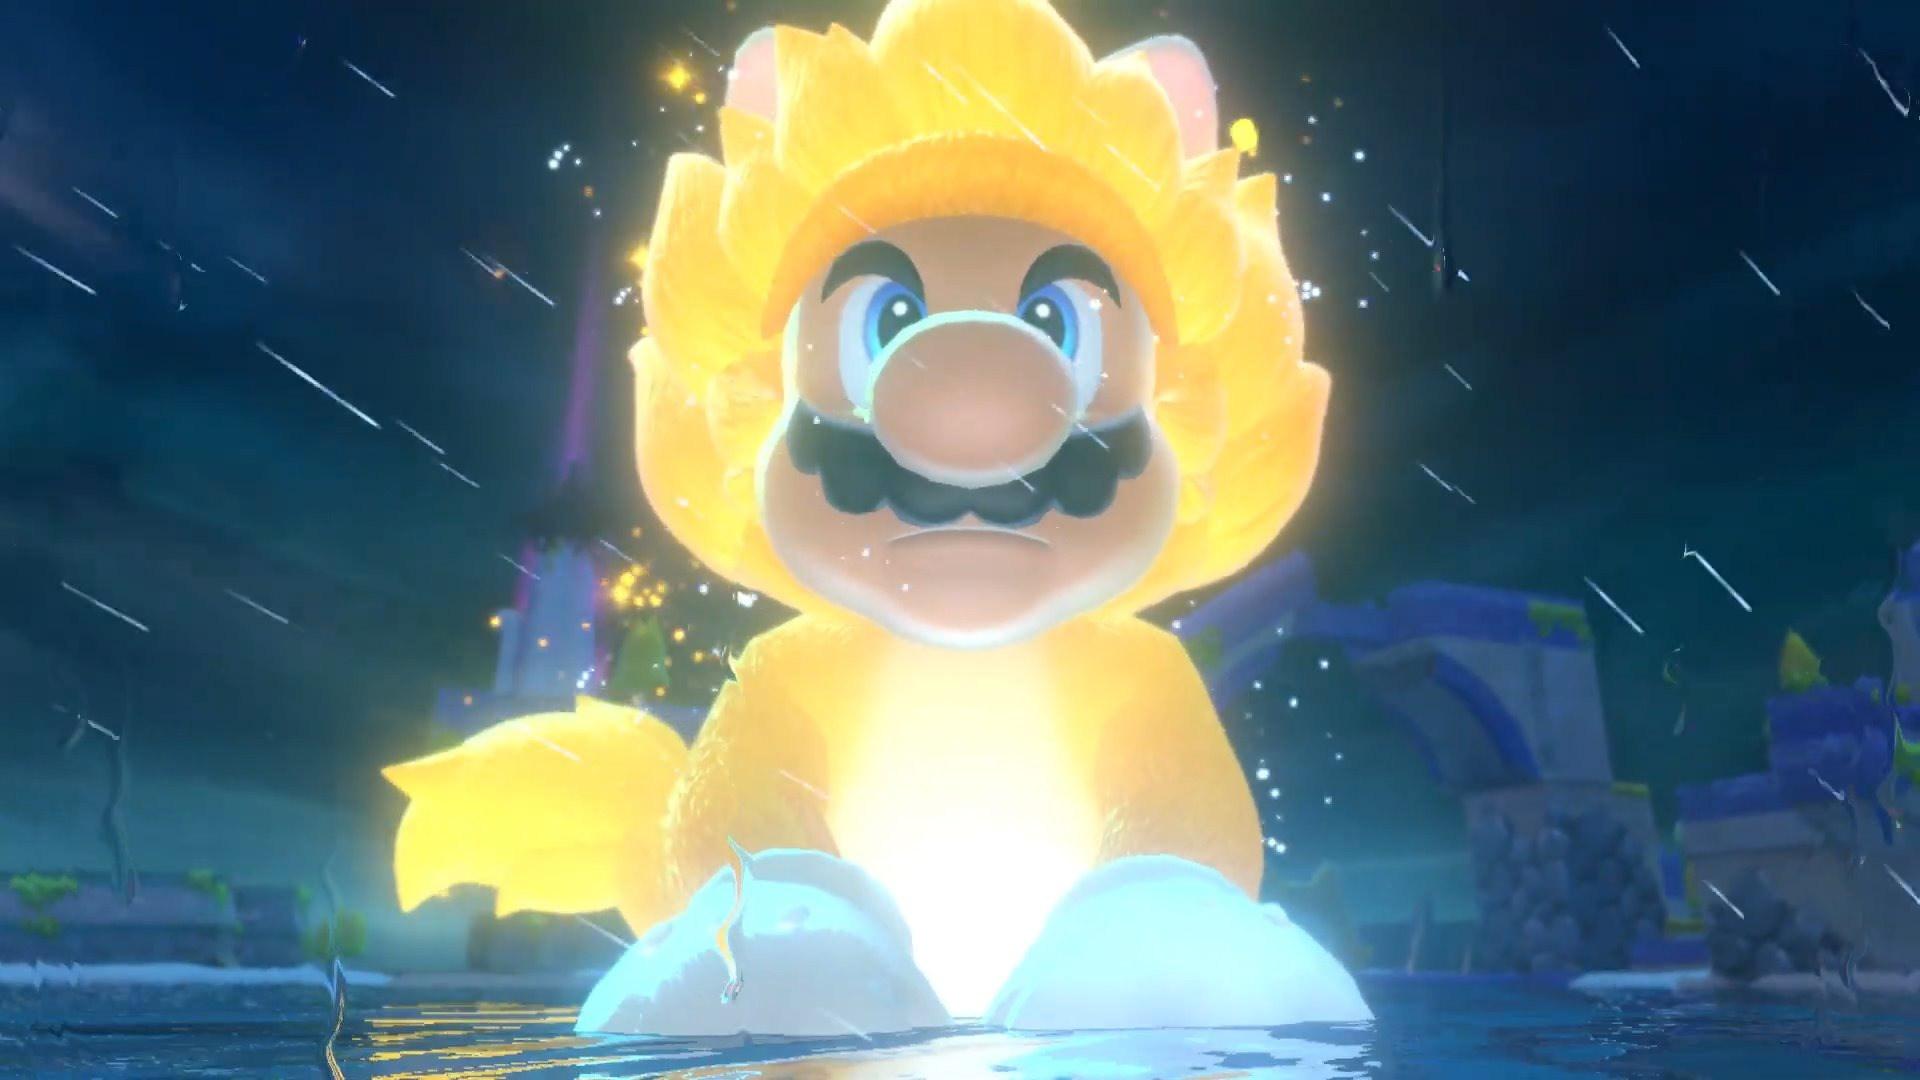 Nintendo, Nintendo Switch, Switch, Videospiel, Super Mario, Jump & Run, Mario, Bowser, Super Mario 3D World + Bowser's Fury, Super Mario 3D, Super Mario 3D World, Bowser's Fury